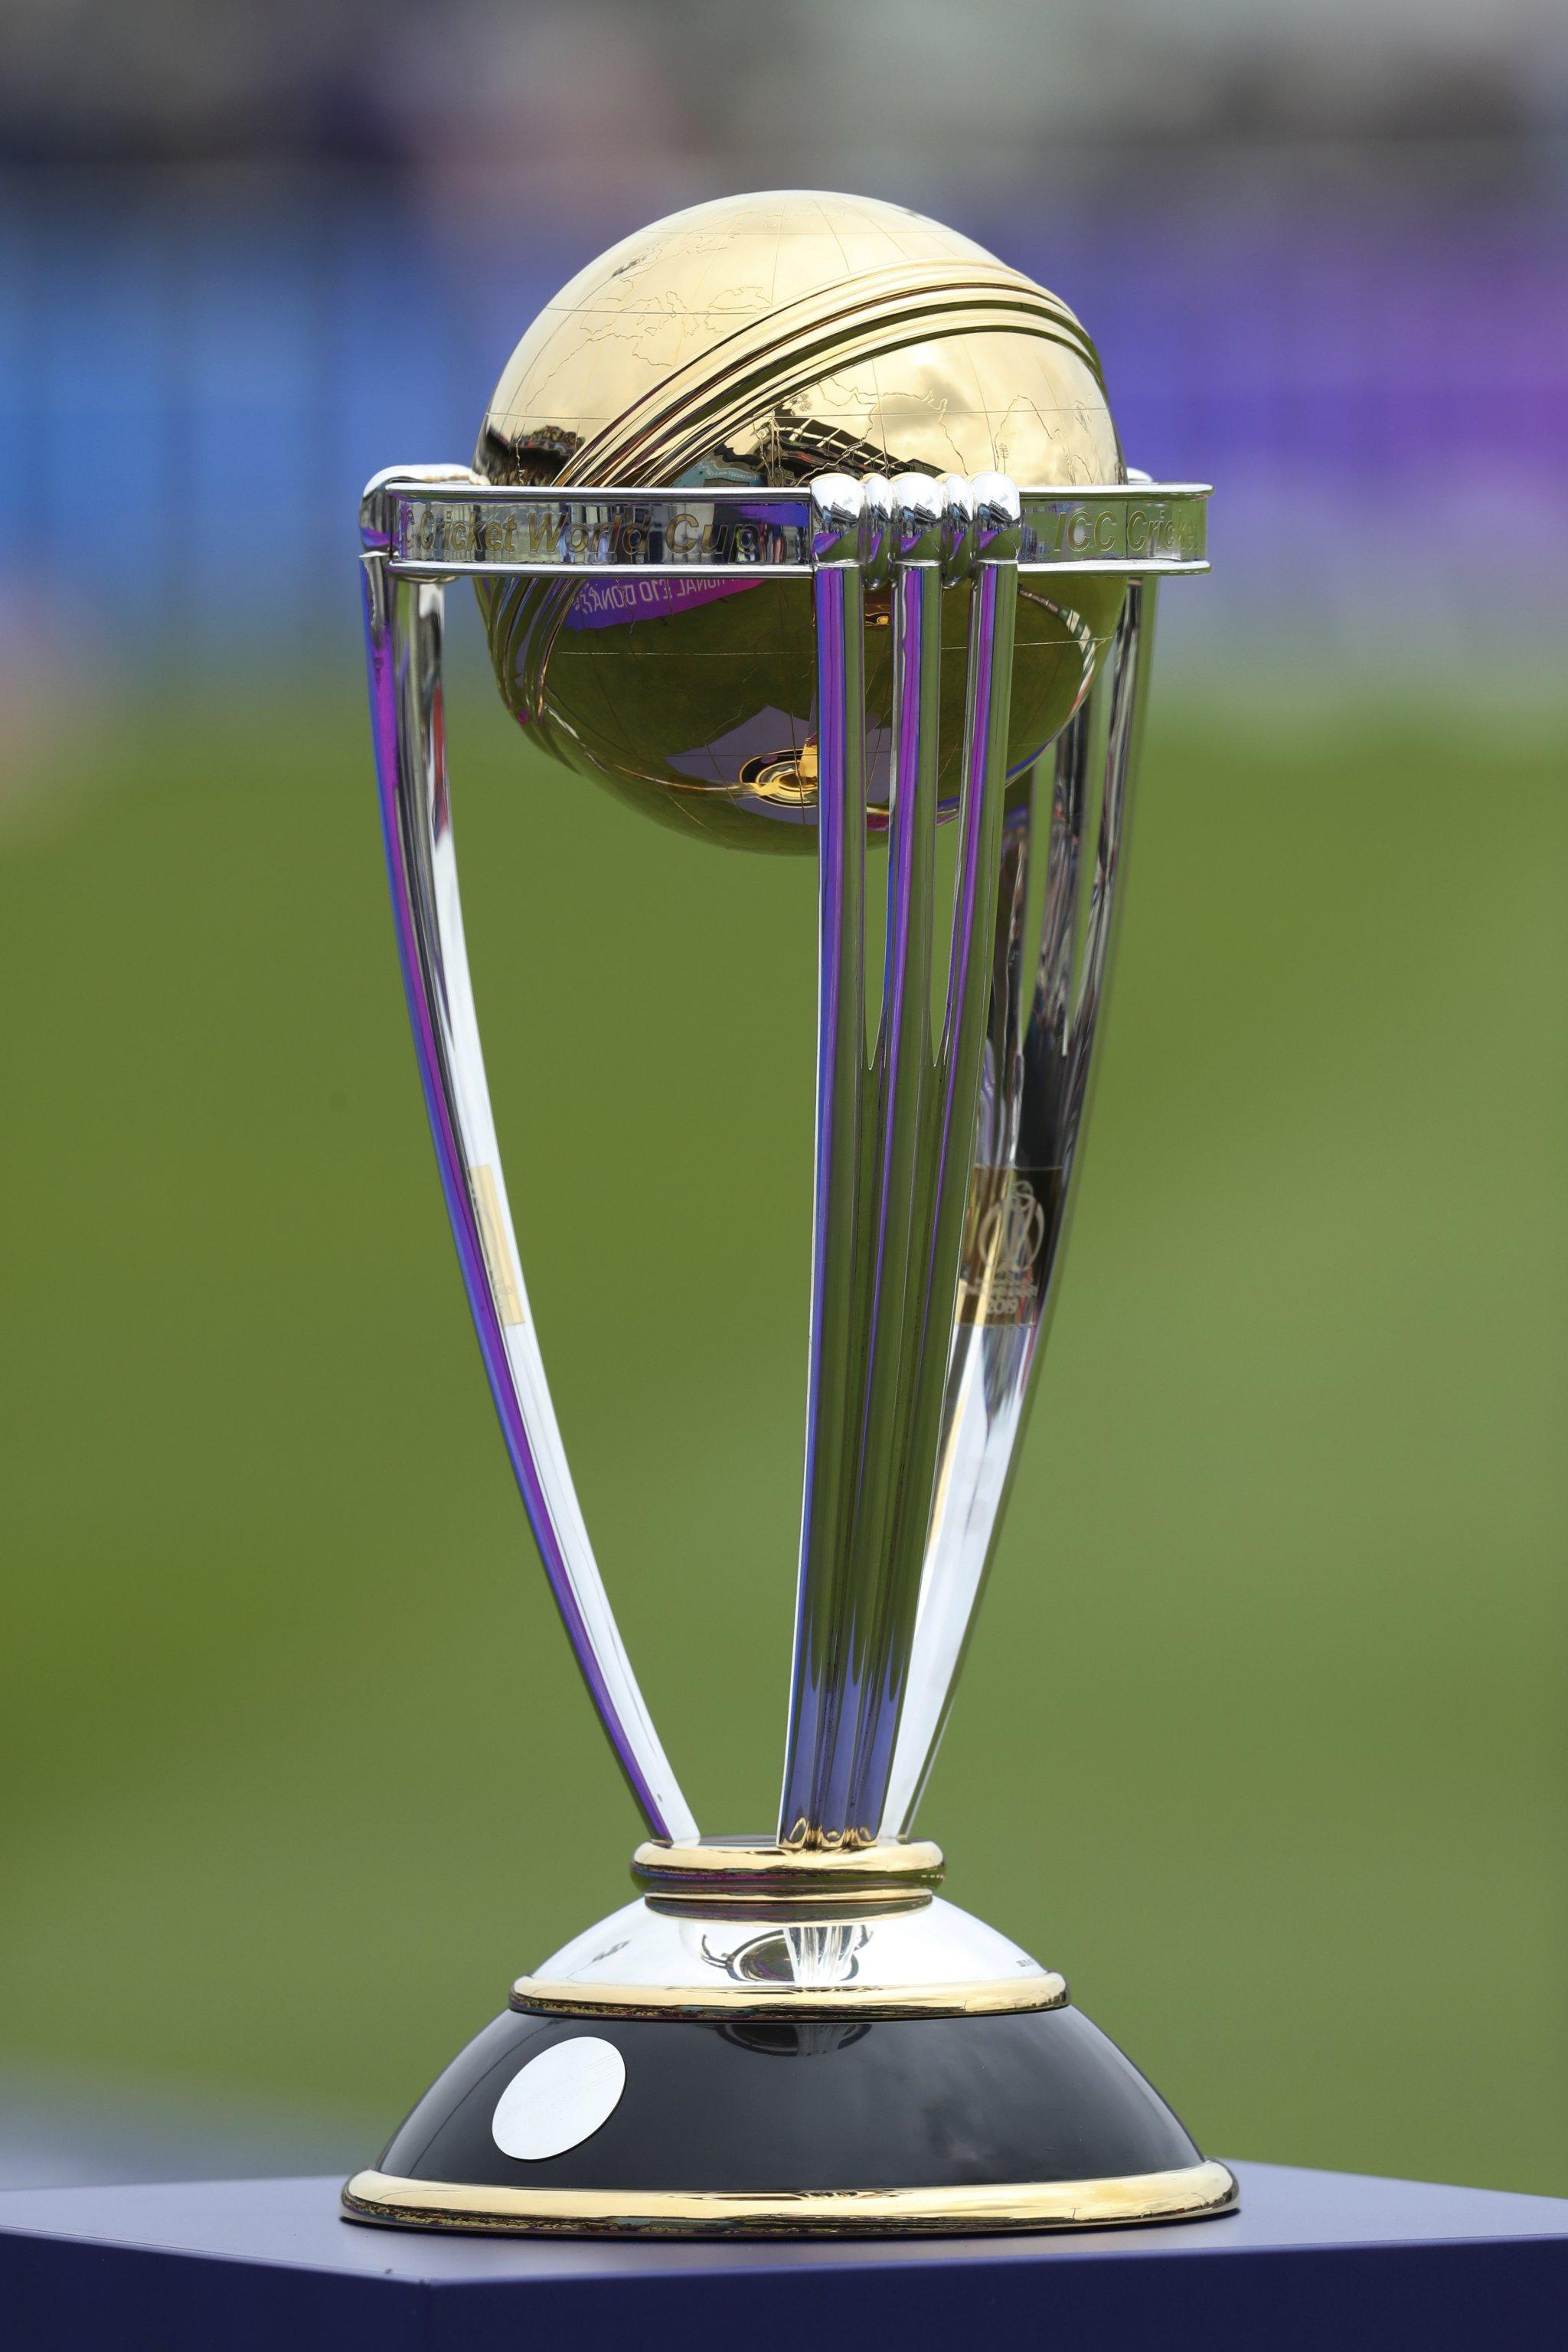 DAZN, Coppa Africa 2a Giornata, Diretta Esclusiva, Palinsest